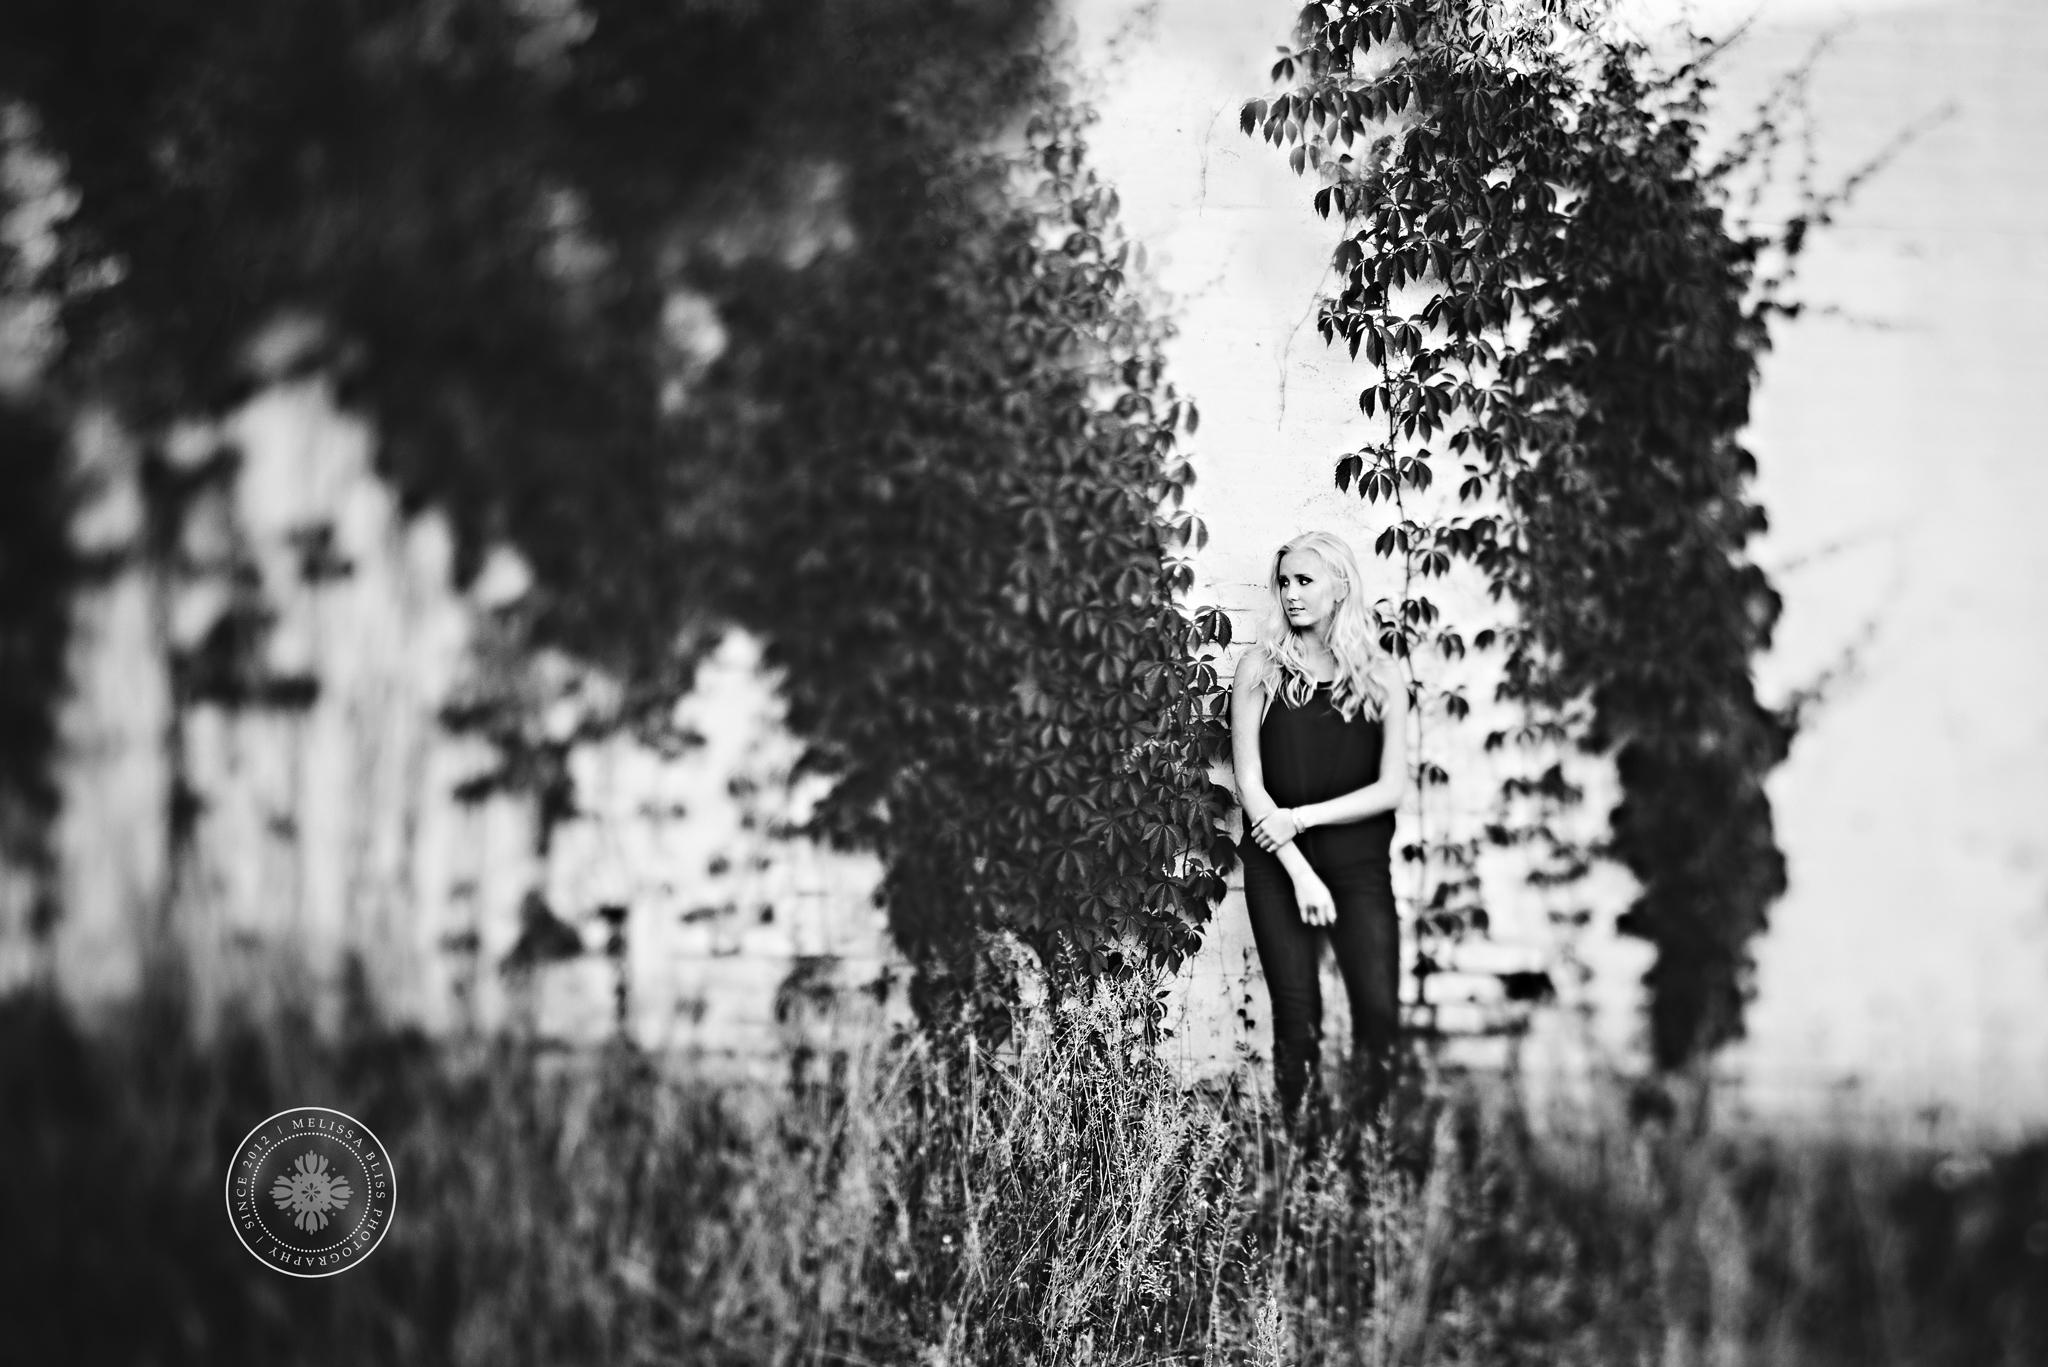 melissa-bliss-photography-fine-art-portraits-norfolk-virginia-beach-photographers